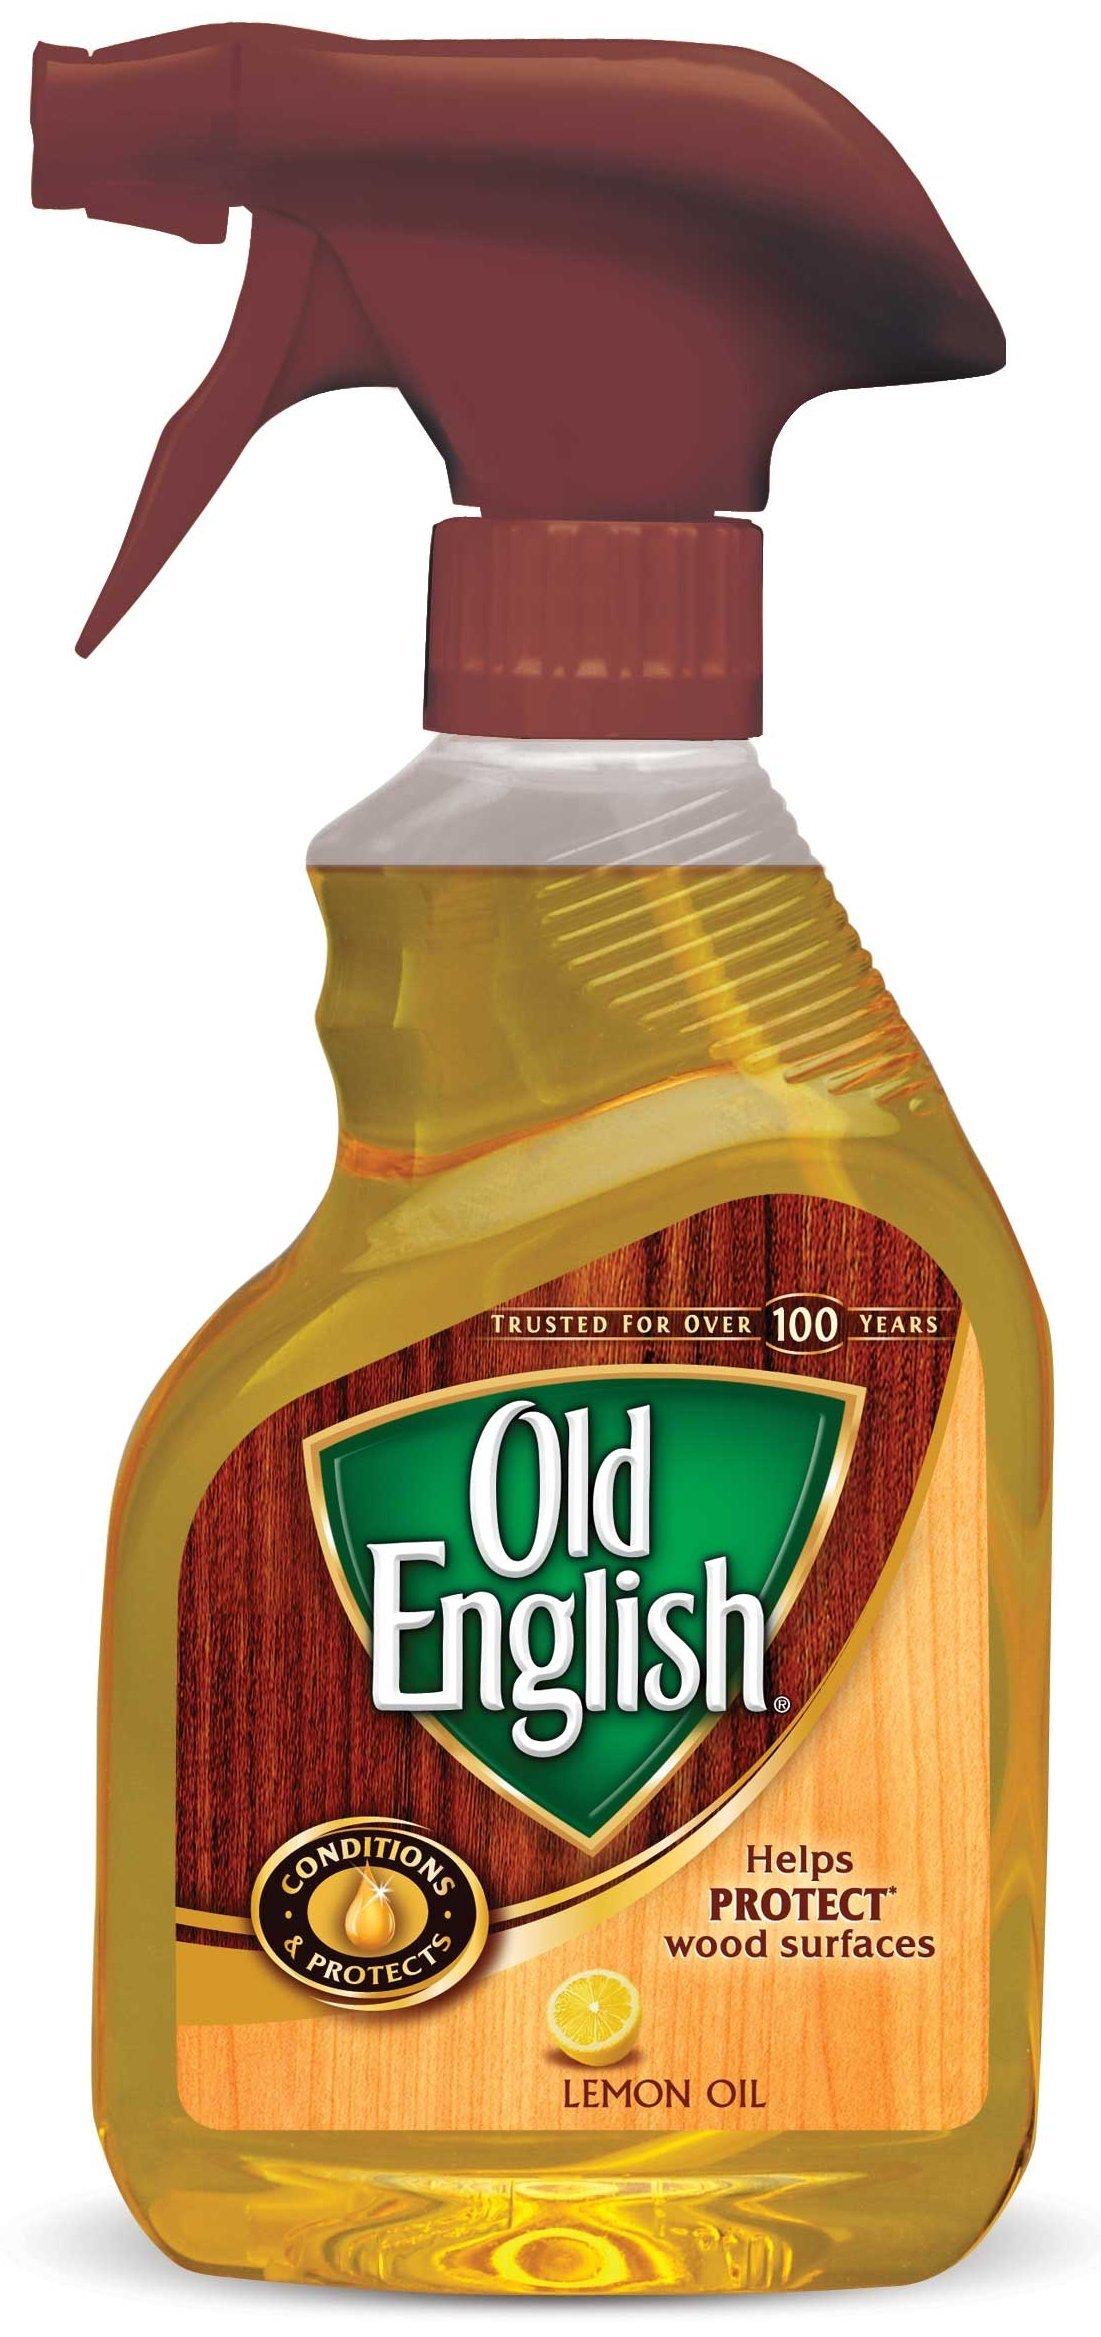 Old English Lemon Oil Furniture Polish, 12 fl oz Bottle (Pack of 9)